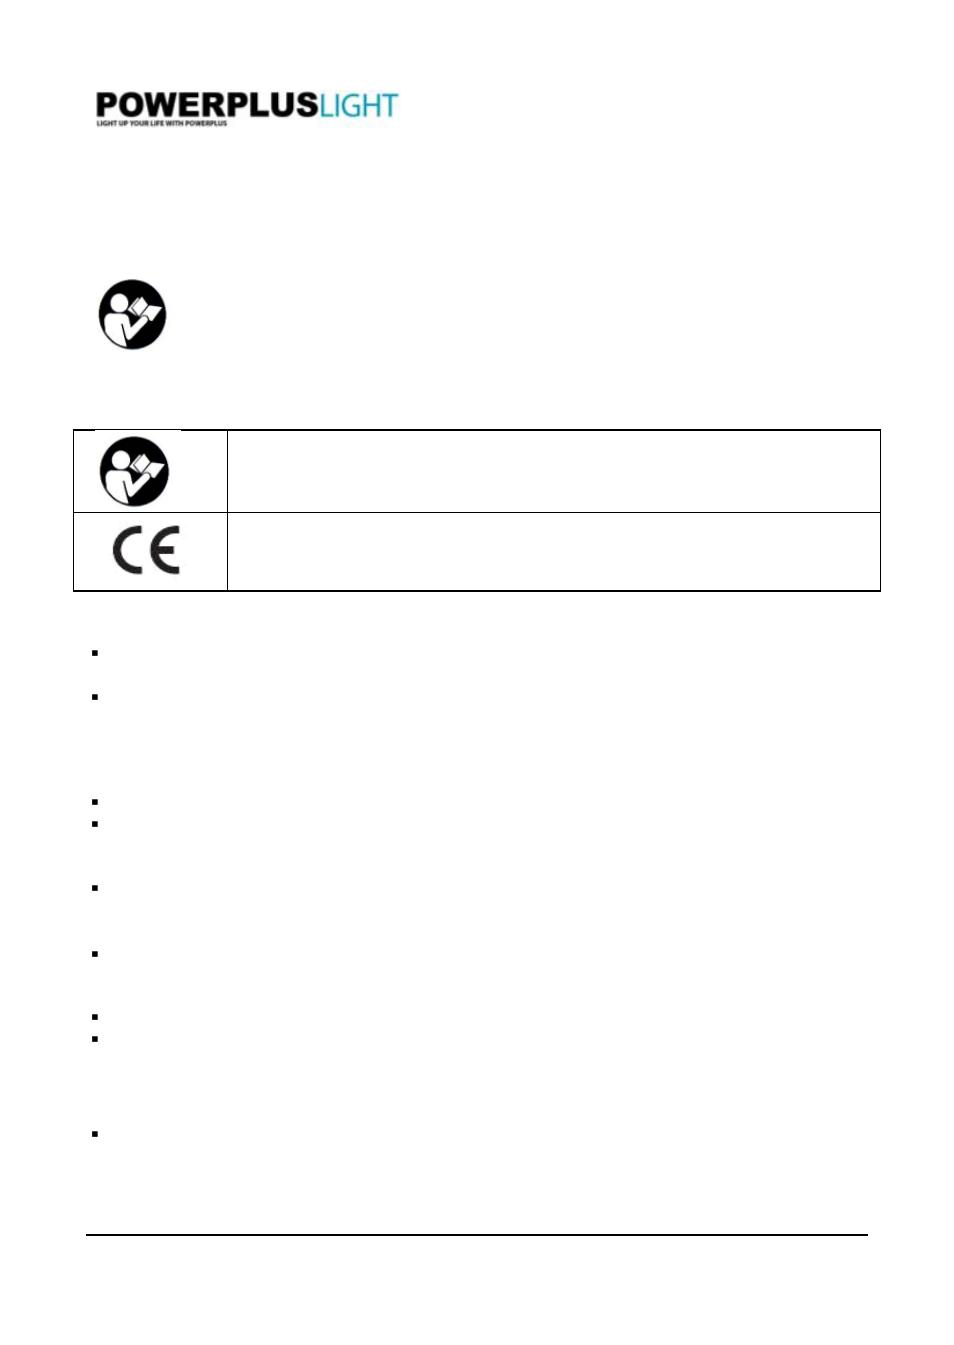 Powerplus Powli240 Led Floodlight 30w En User Manual 2 Pages Wiring Diagram